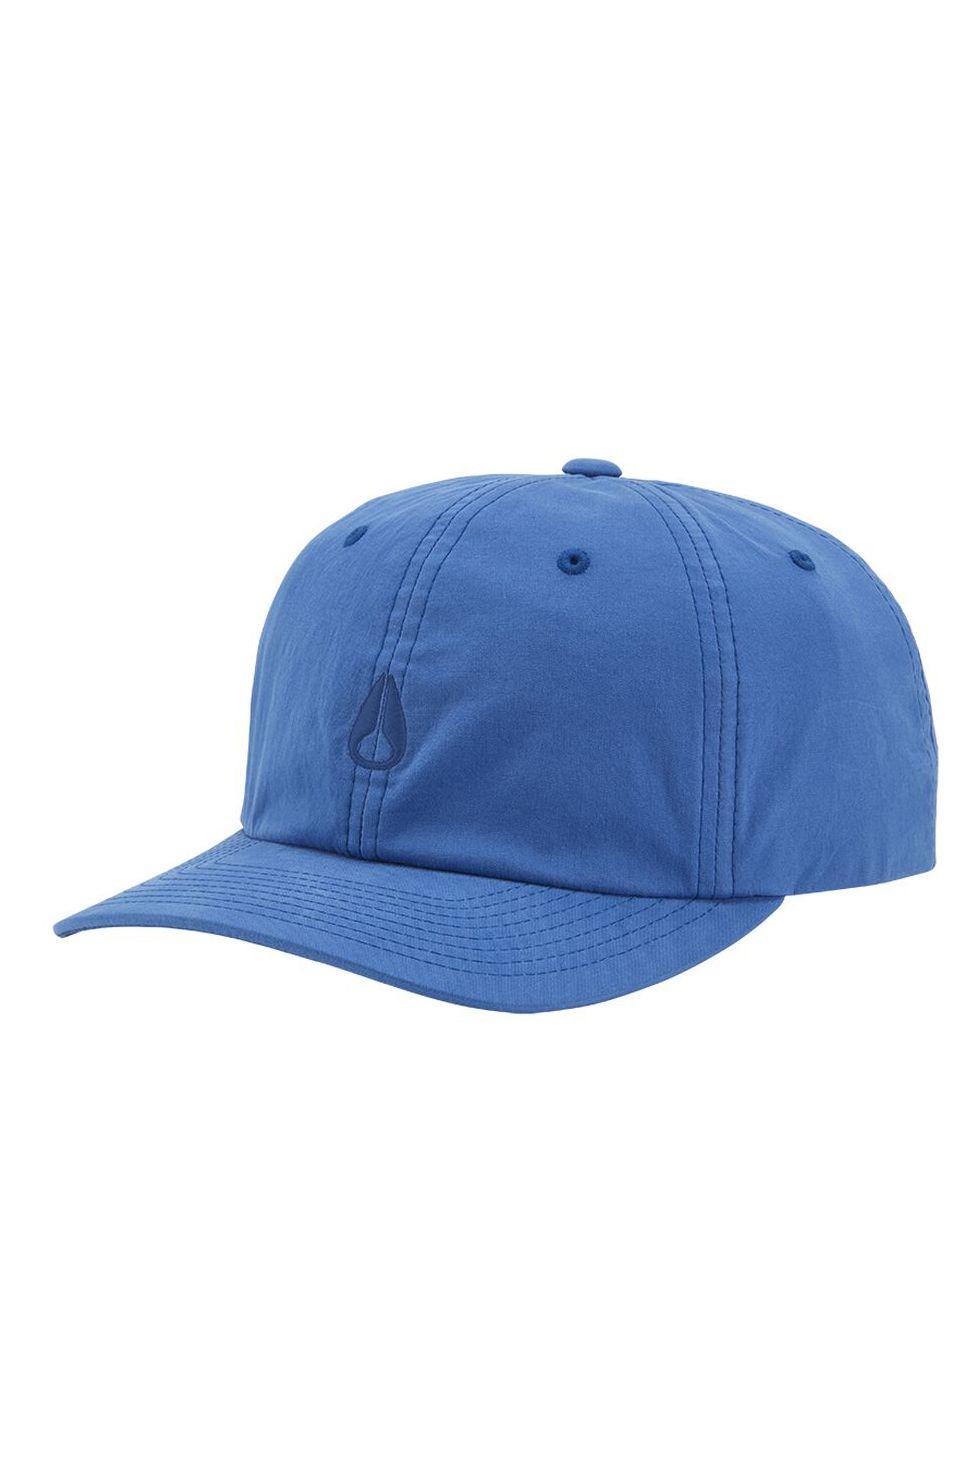 Bone Nixon AGENT STRAPBACK HAT Horizon Blue